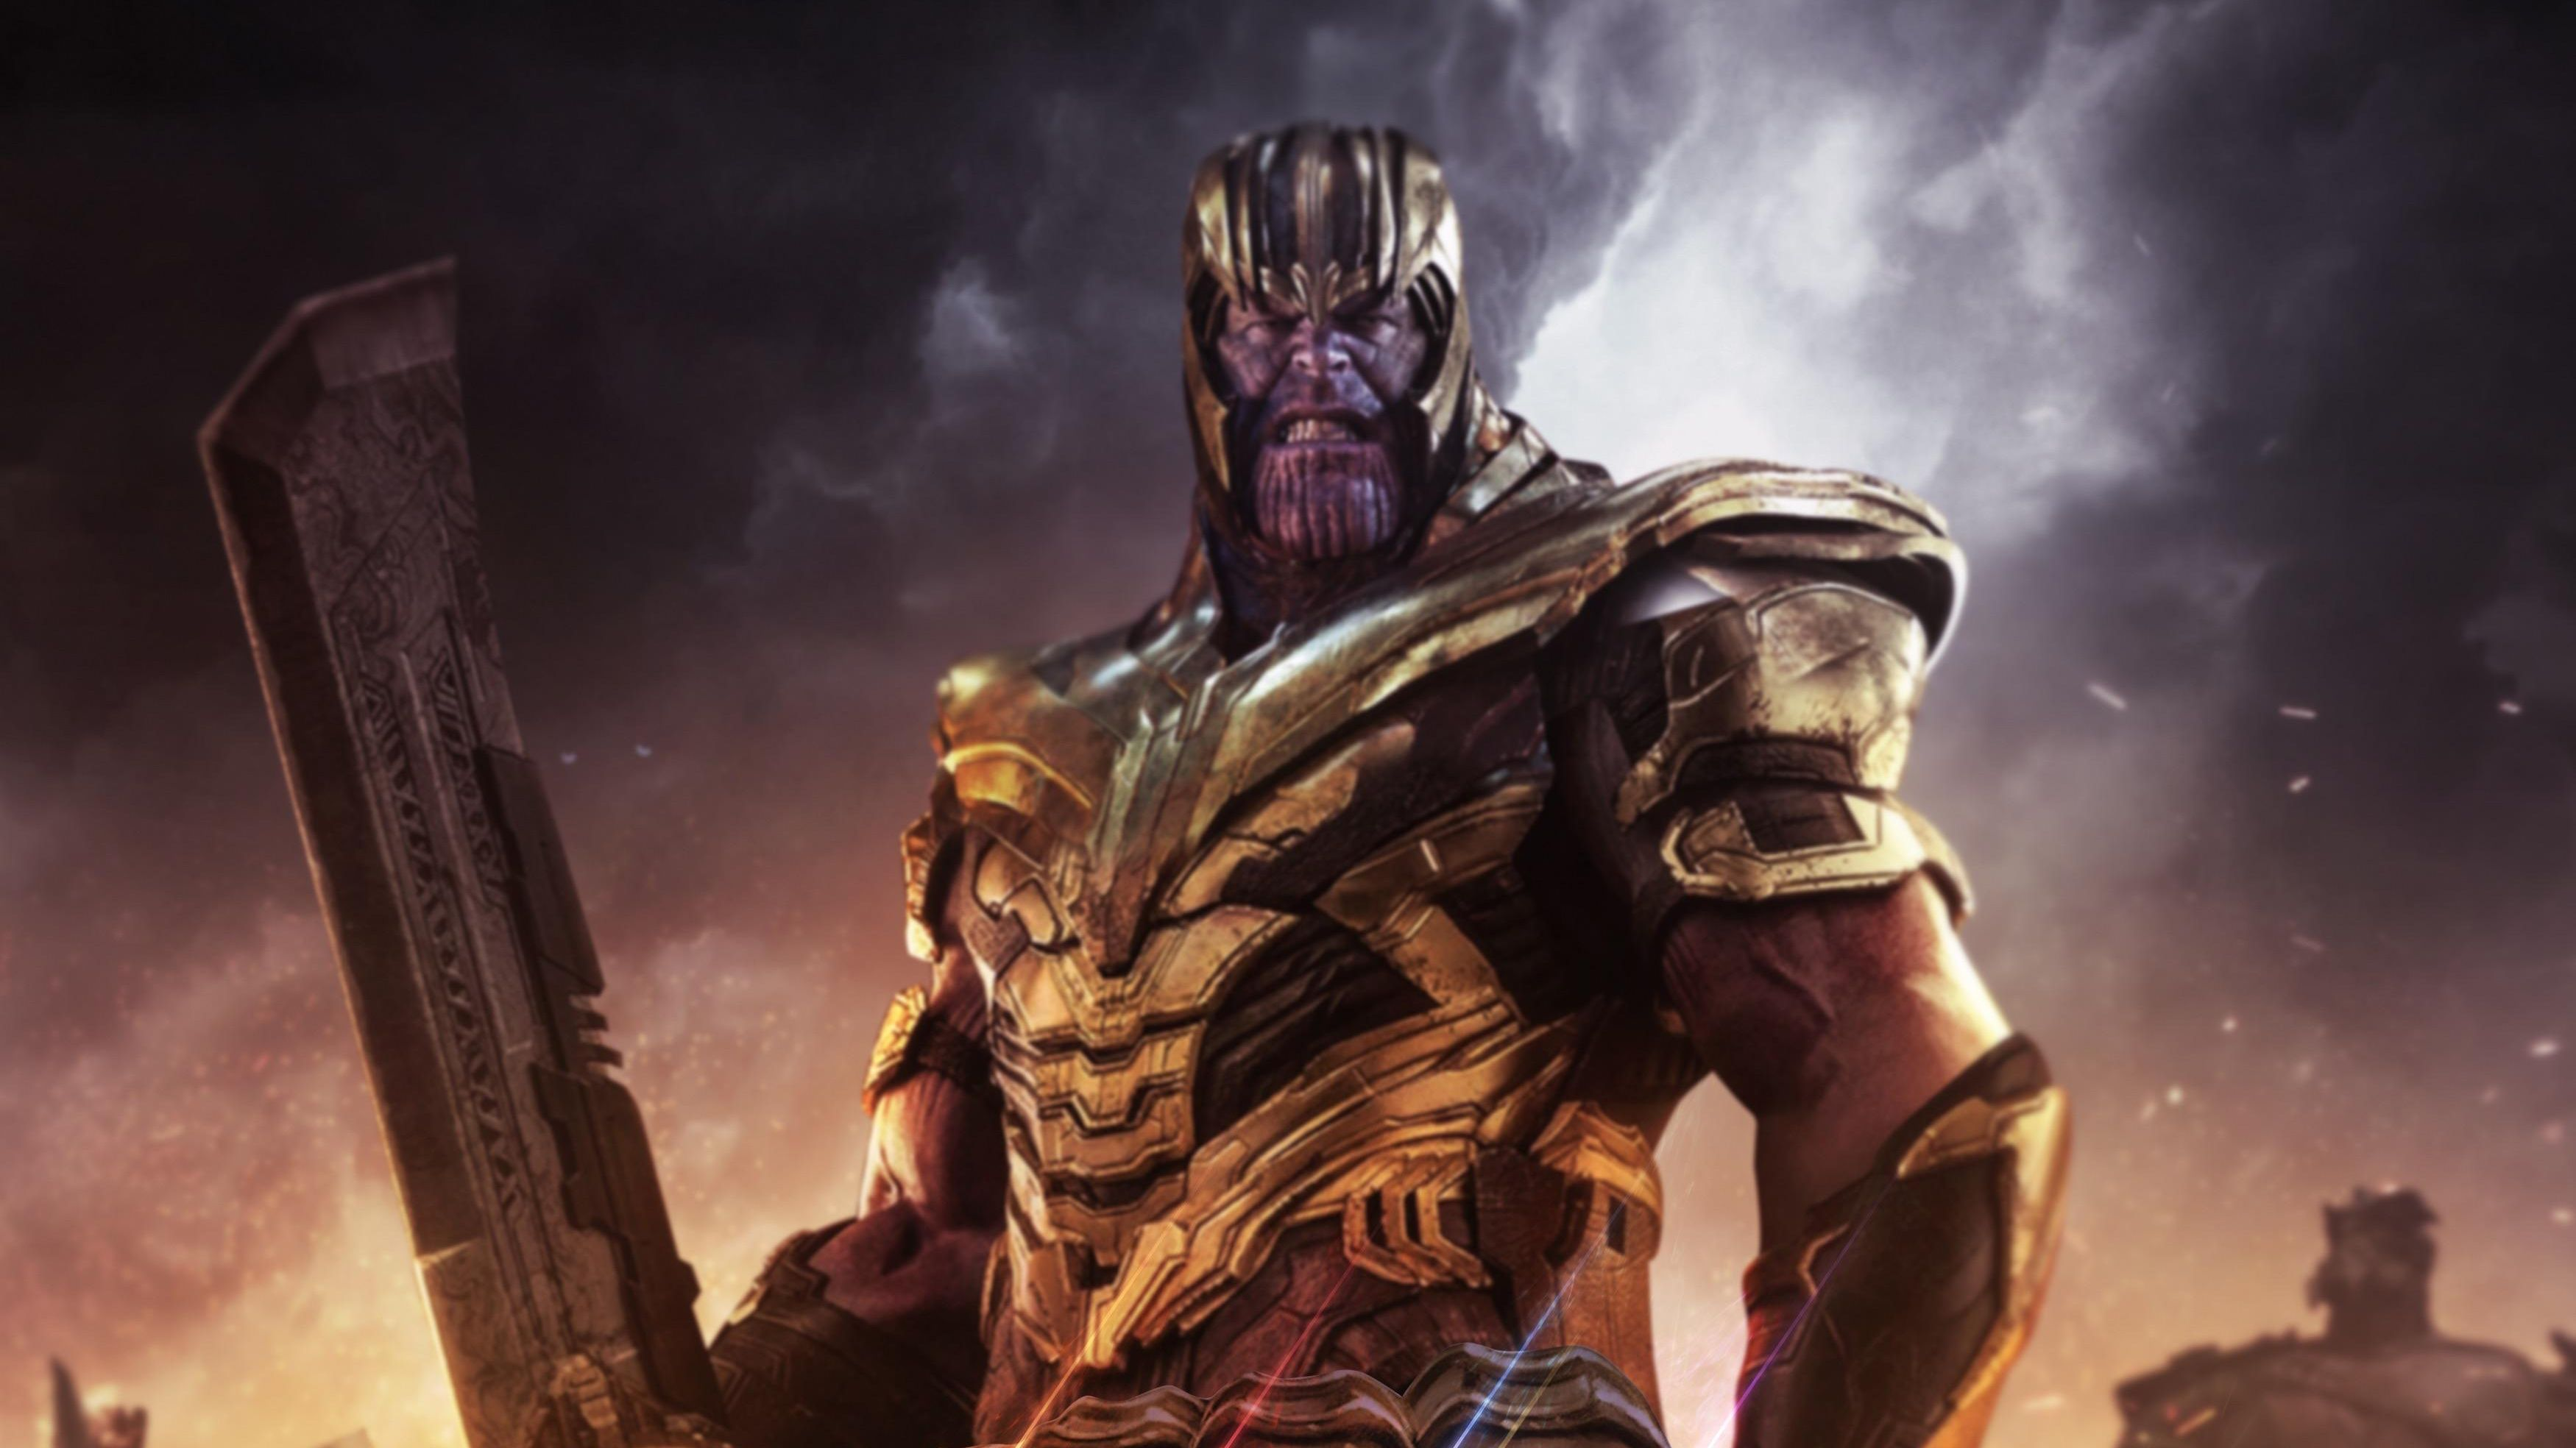 Thanos Endgame Wallpapers Top Free Thanos Endgame Backgrounds Wallpaperaccess